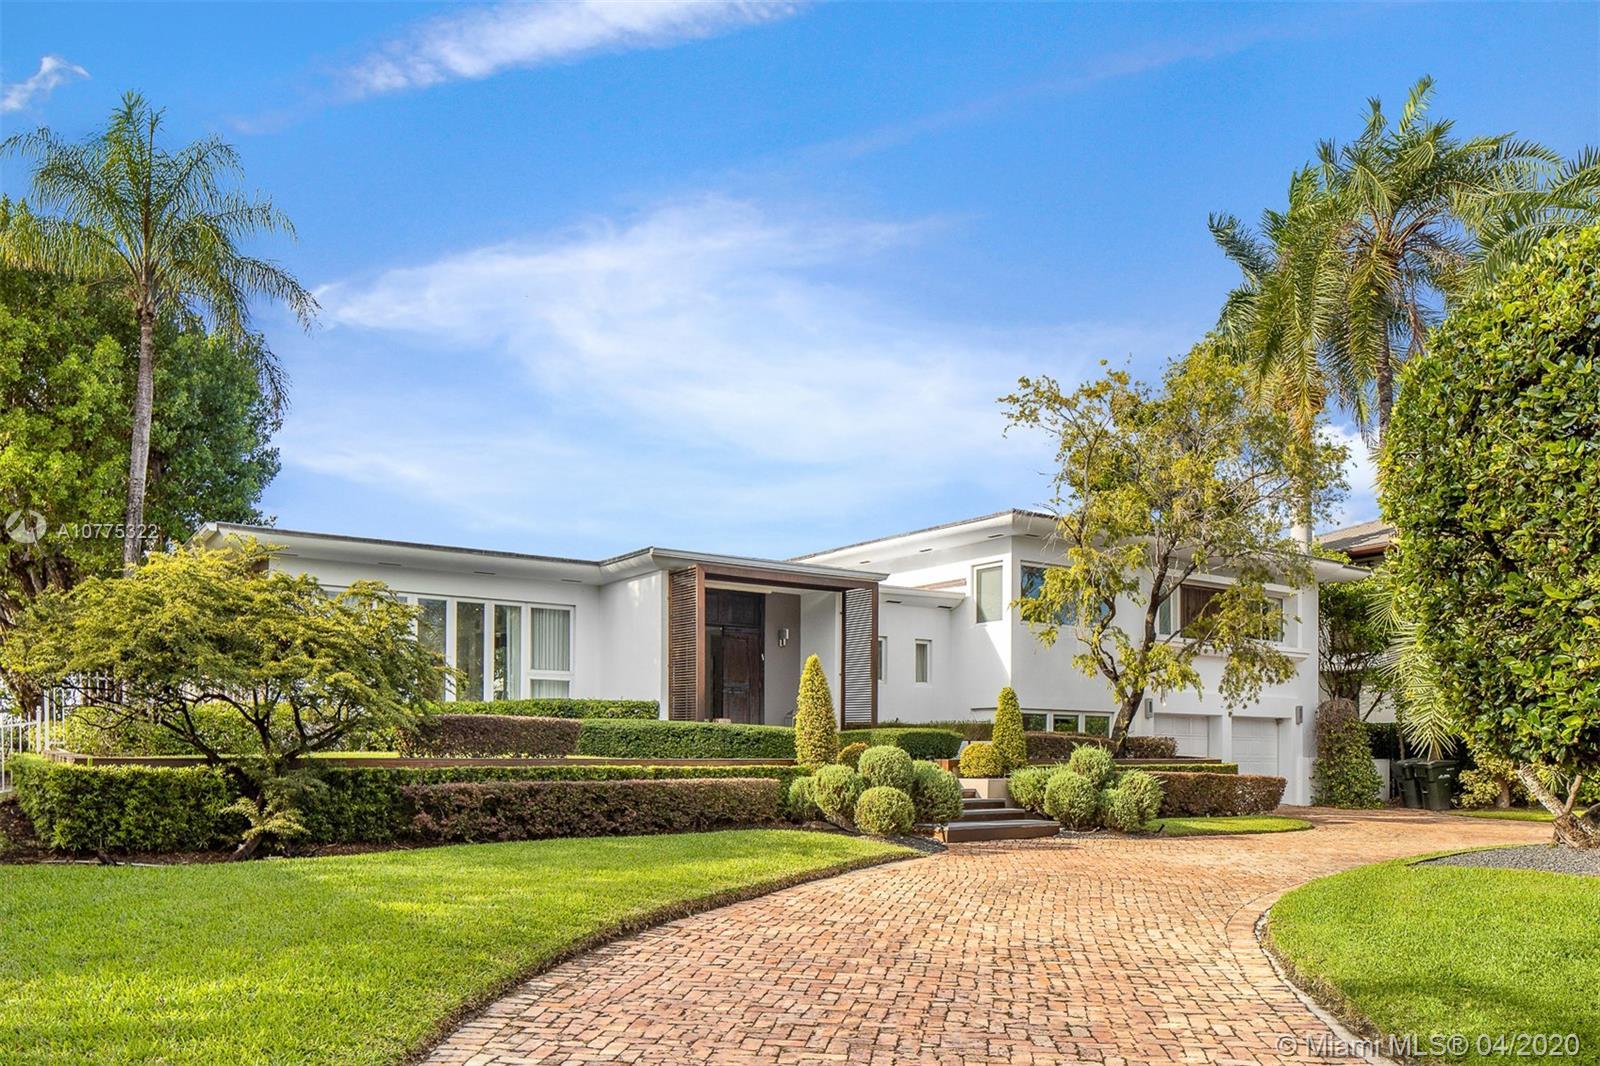 10140 W Broadview Dr, Bay Harbor Islands, FL 33154 - Bay Harbor Islands, FL real estate listing